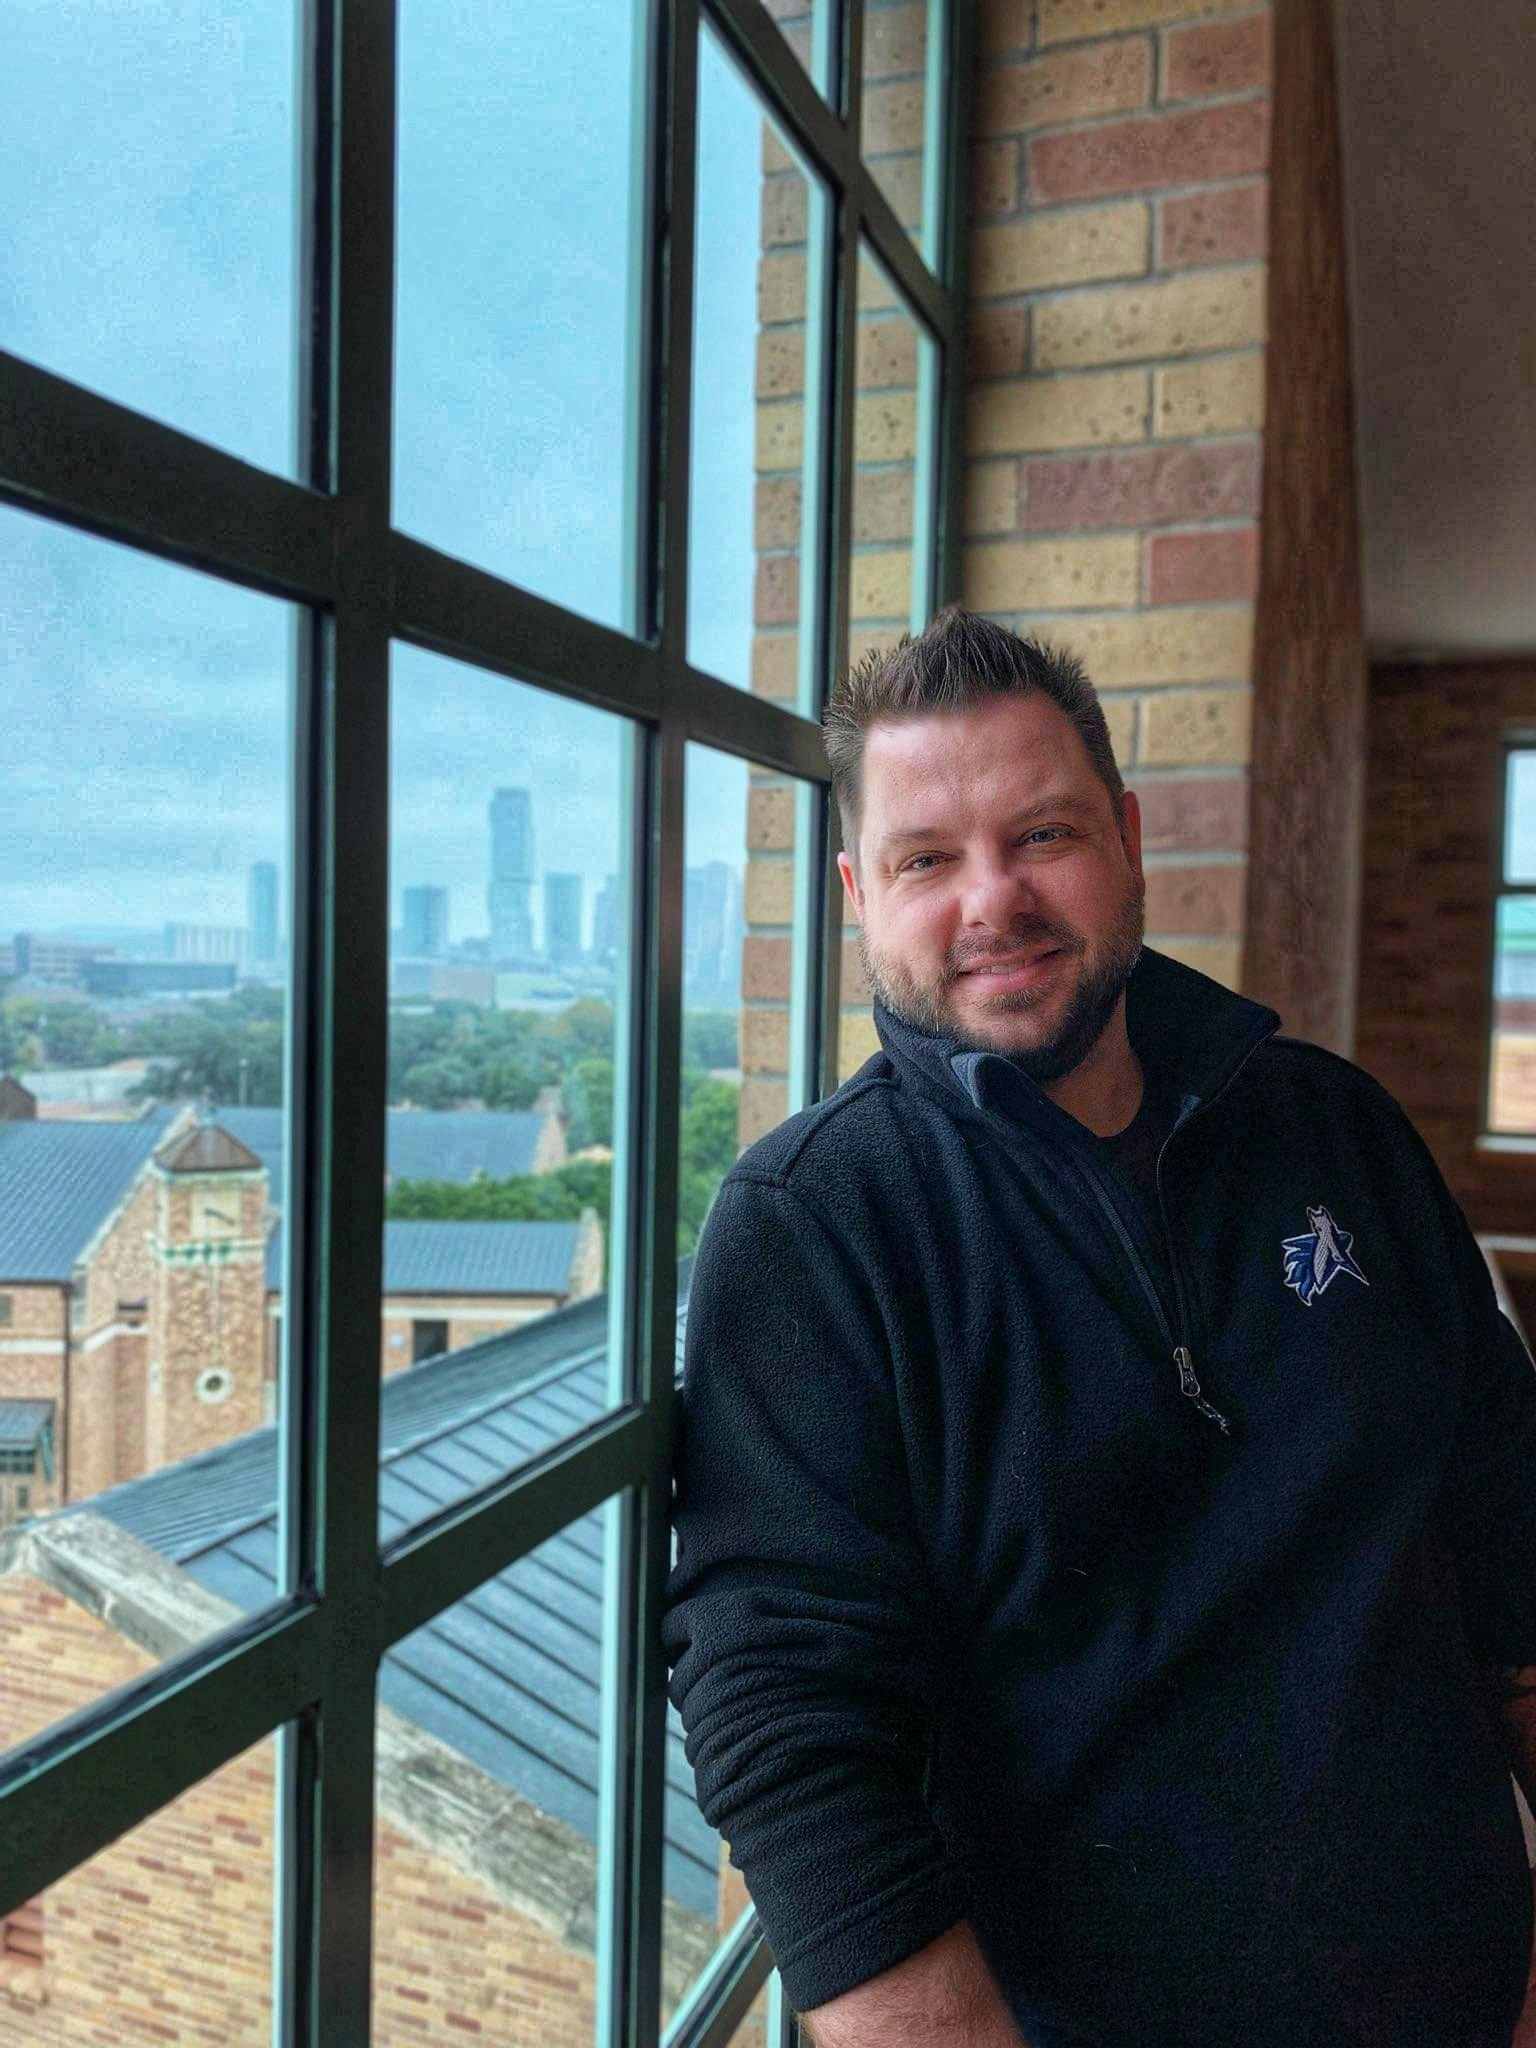 Brian Cheslik chosen to lead 2020 NTD Theatre Immersion Program as Director